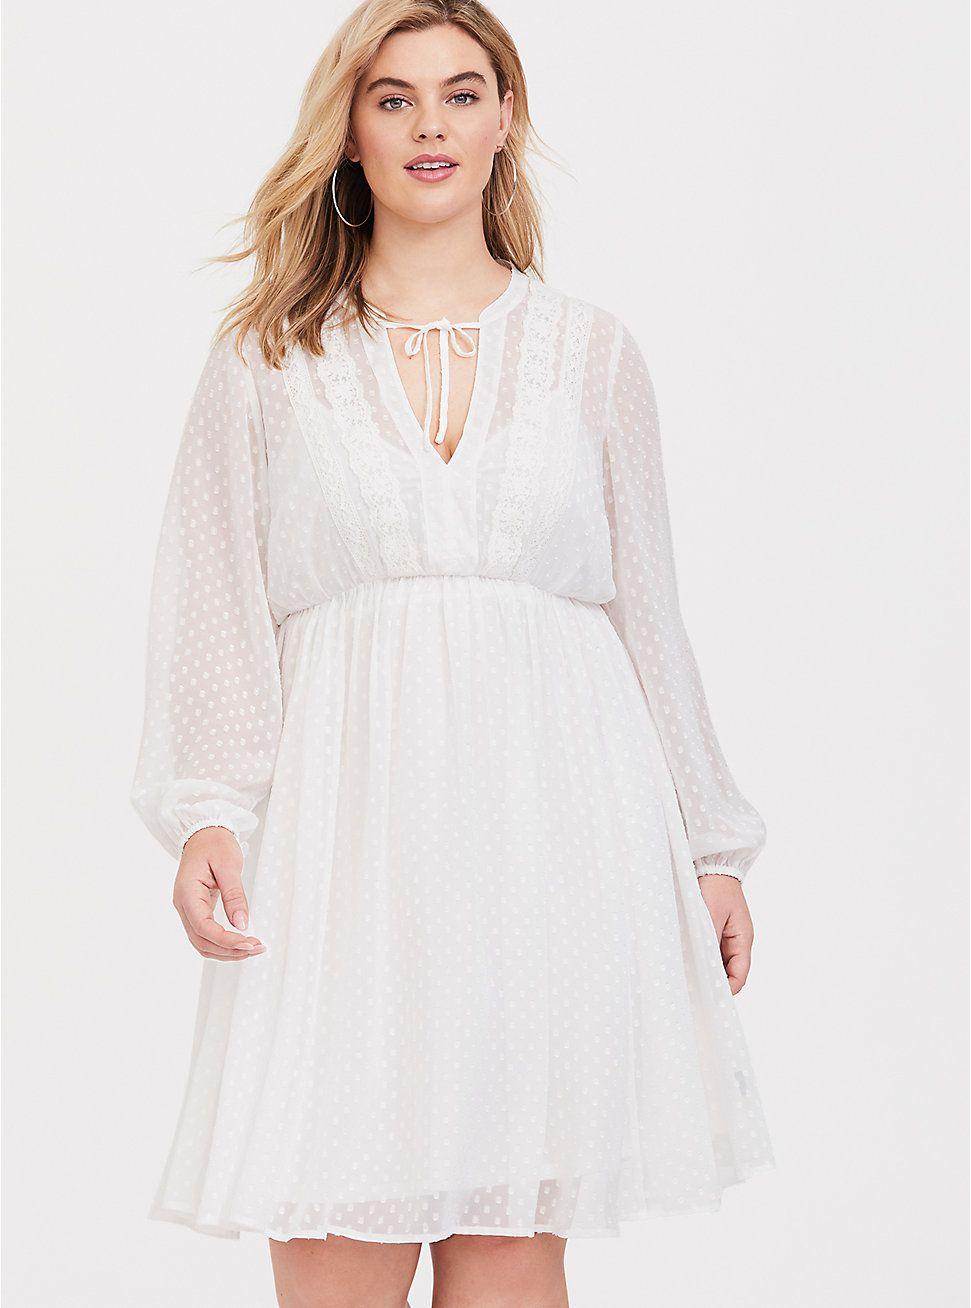 White Clip Dot Chiffon Babydoll Dress Chiffon Babydoll Dress Long Sleeve Babydoll Dress White Boho Dress [ 1308 x 971 Pixel ]